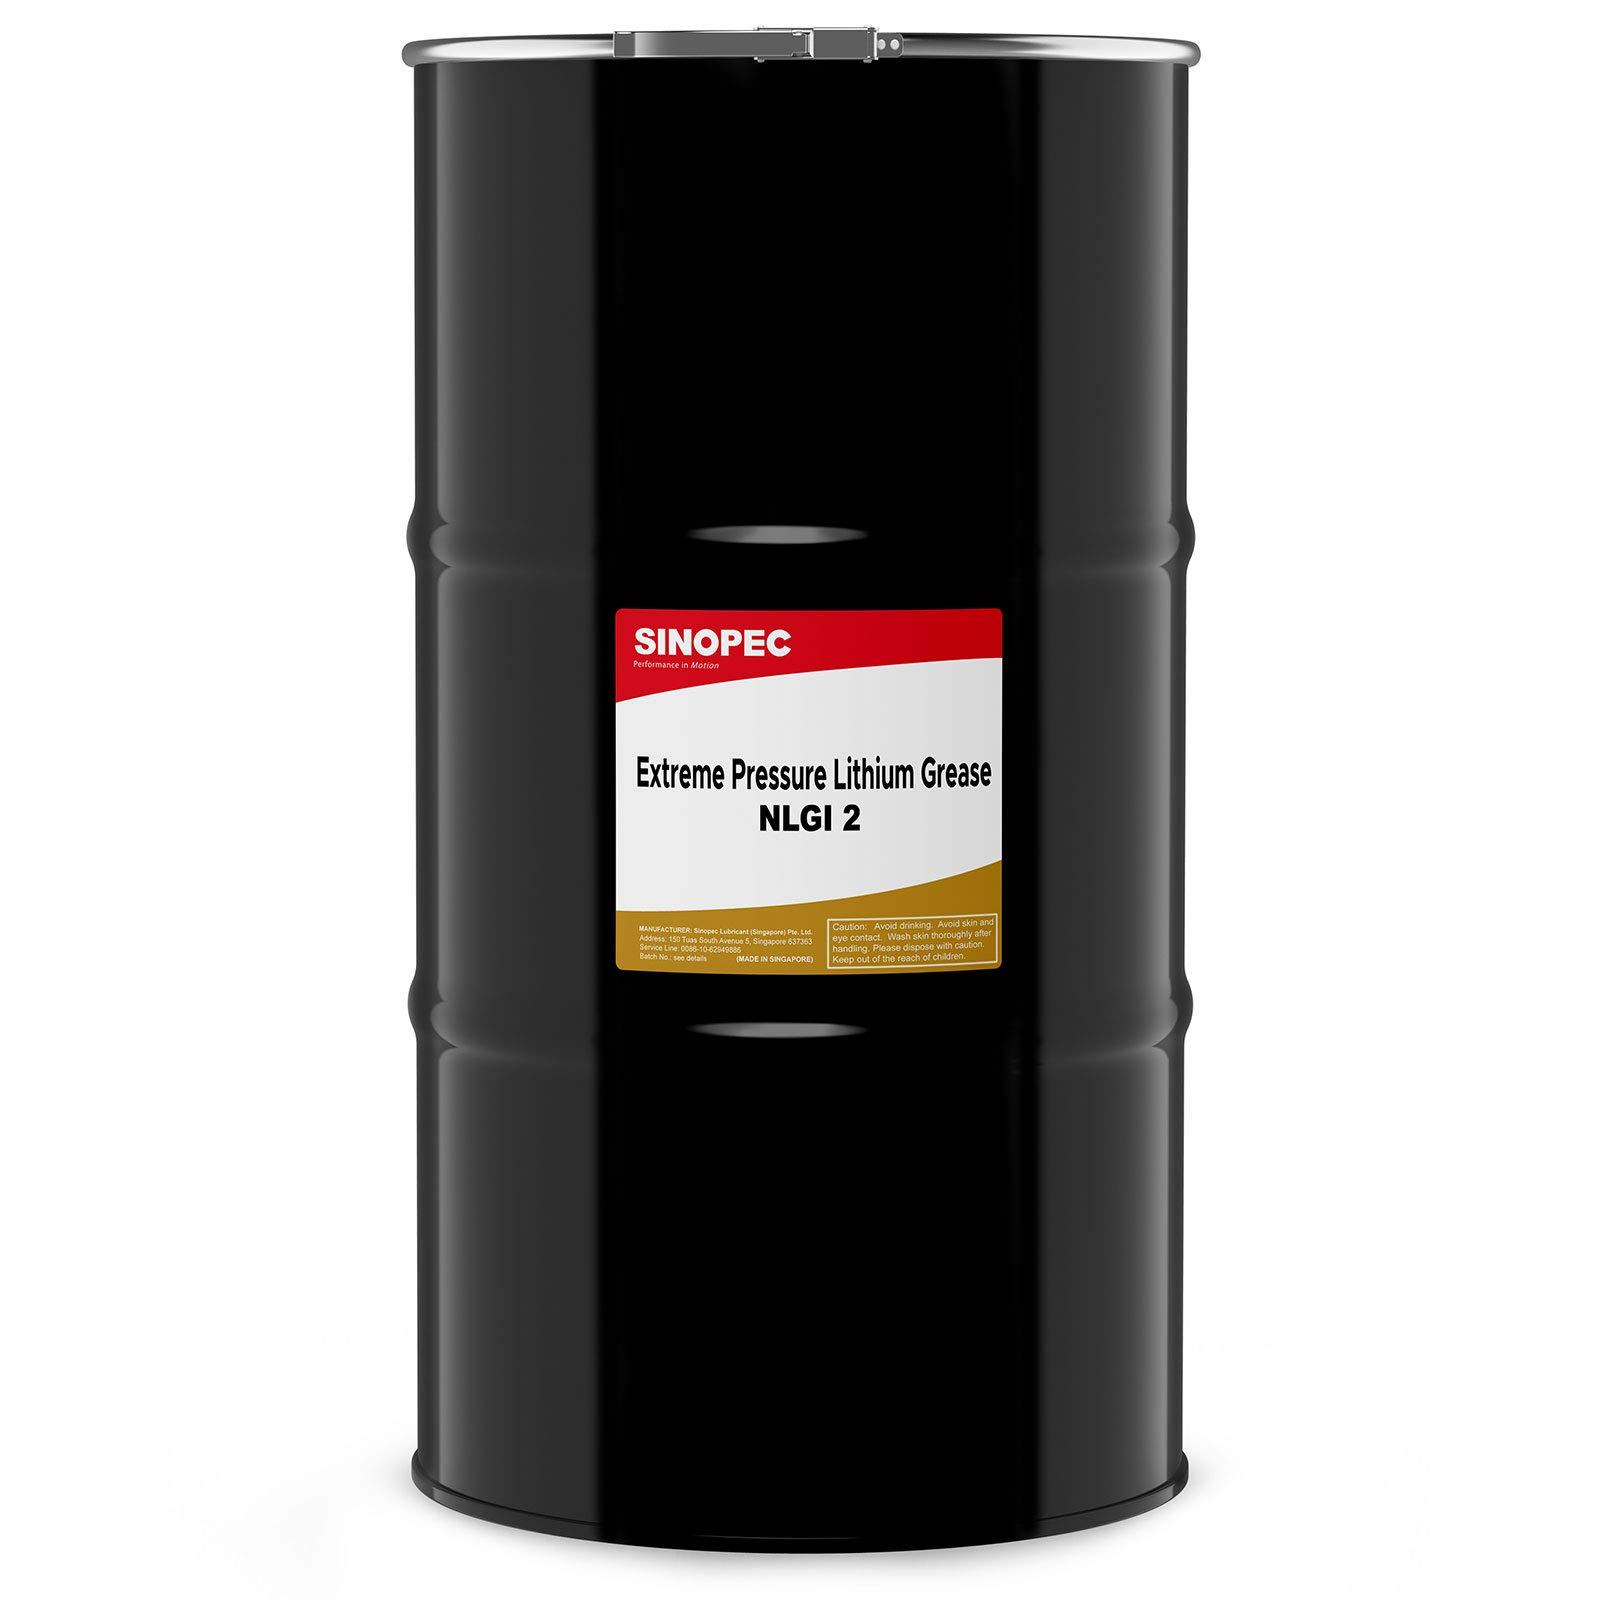 Sinopec (EP2) Extreme Pressure Multipurpose Lithium Grease, NLGI 2-120LB. (16 Gallon) Keg